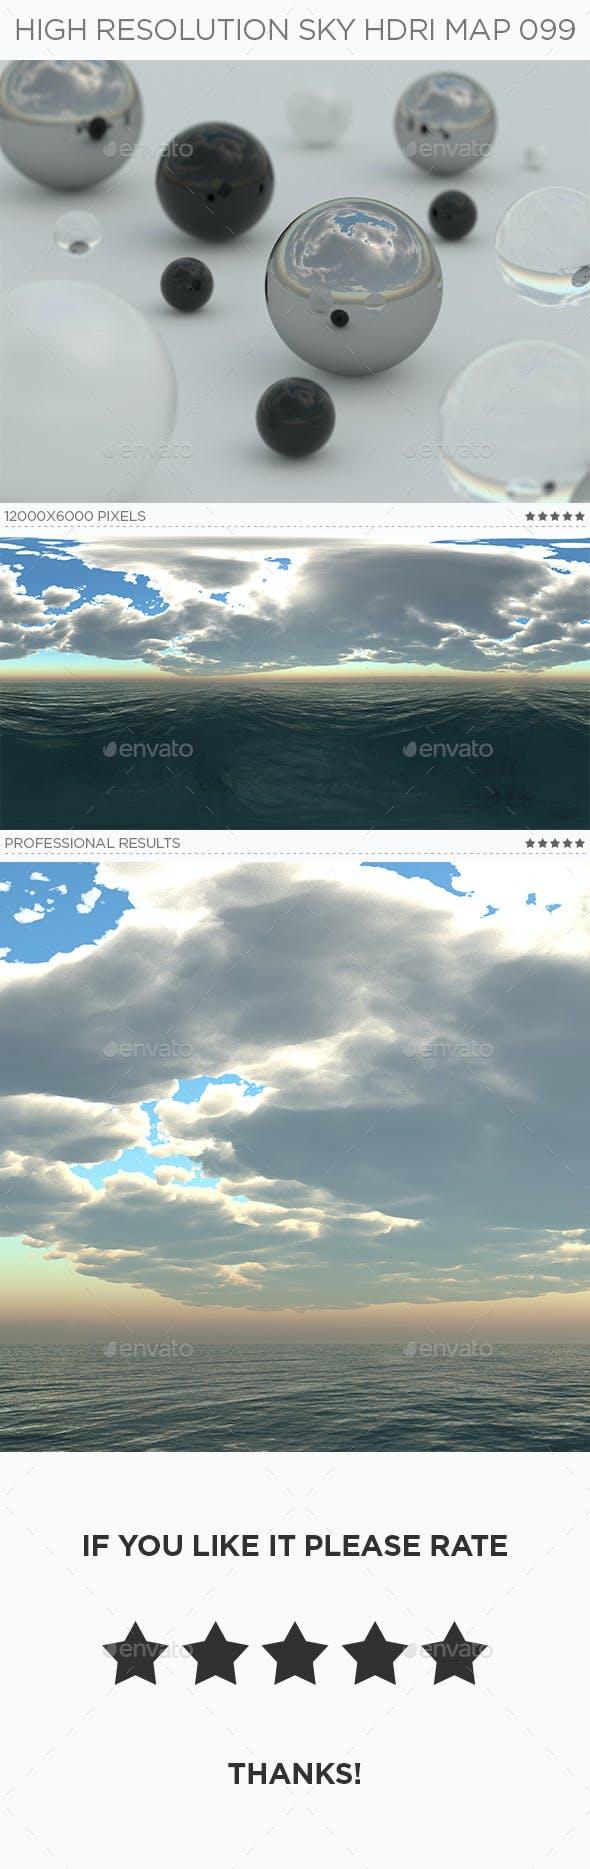 High Resolution Sky HDRi Map 099 - 3DOcean Item for Sale